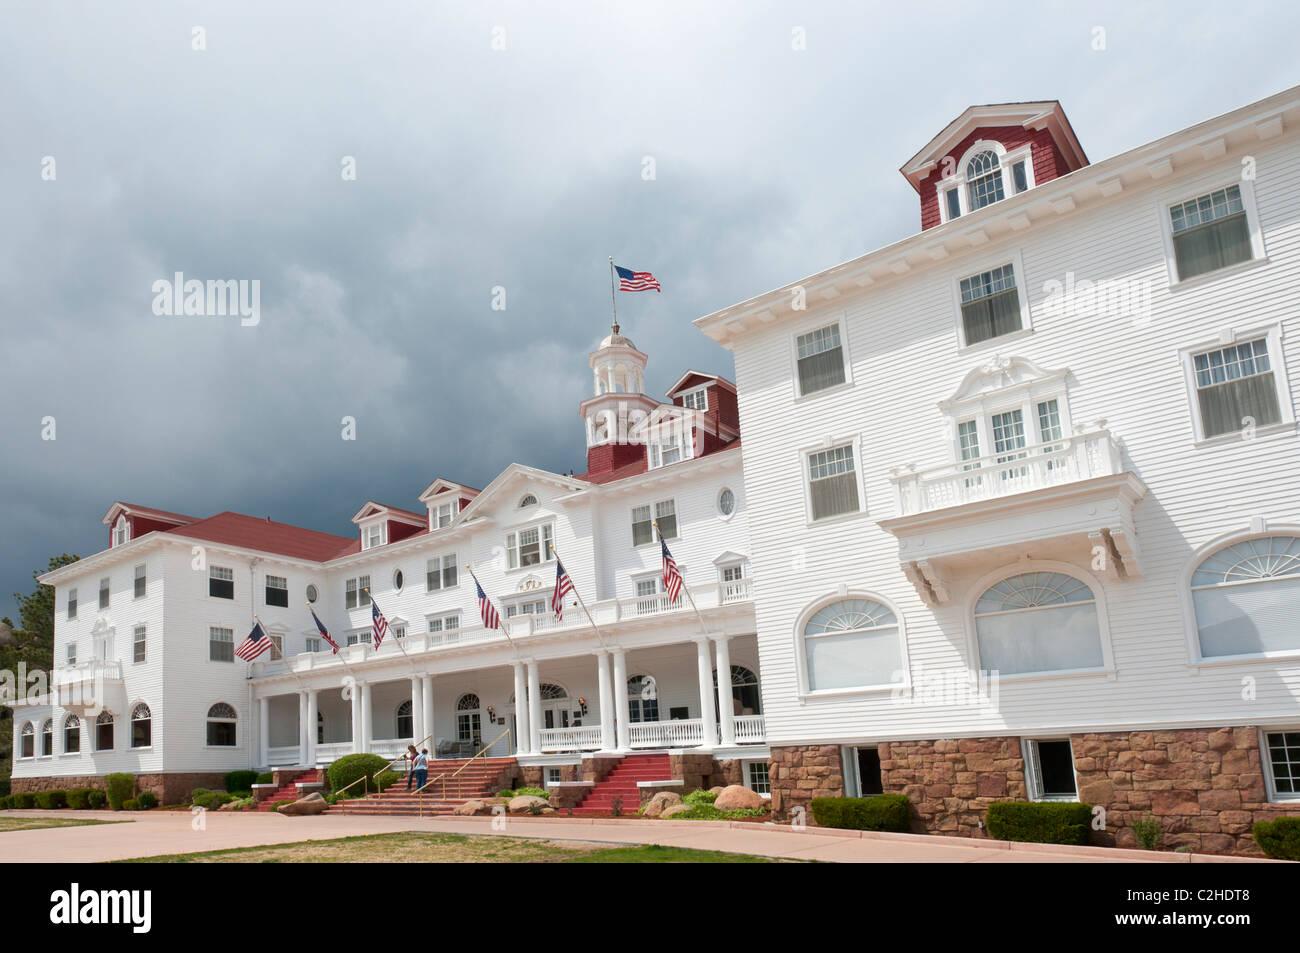 Colorado, Estes Park, Historic Stanley Hotel opened 1909 - Stock Image